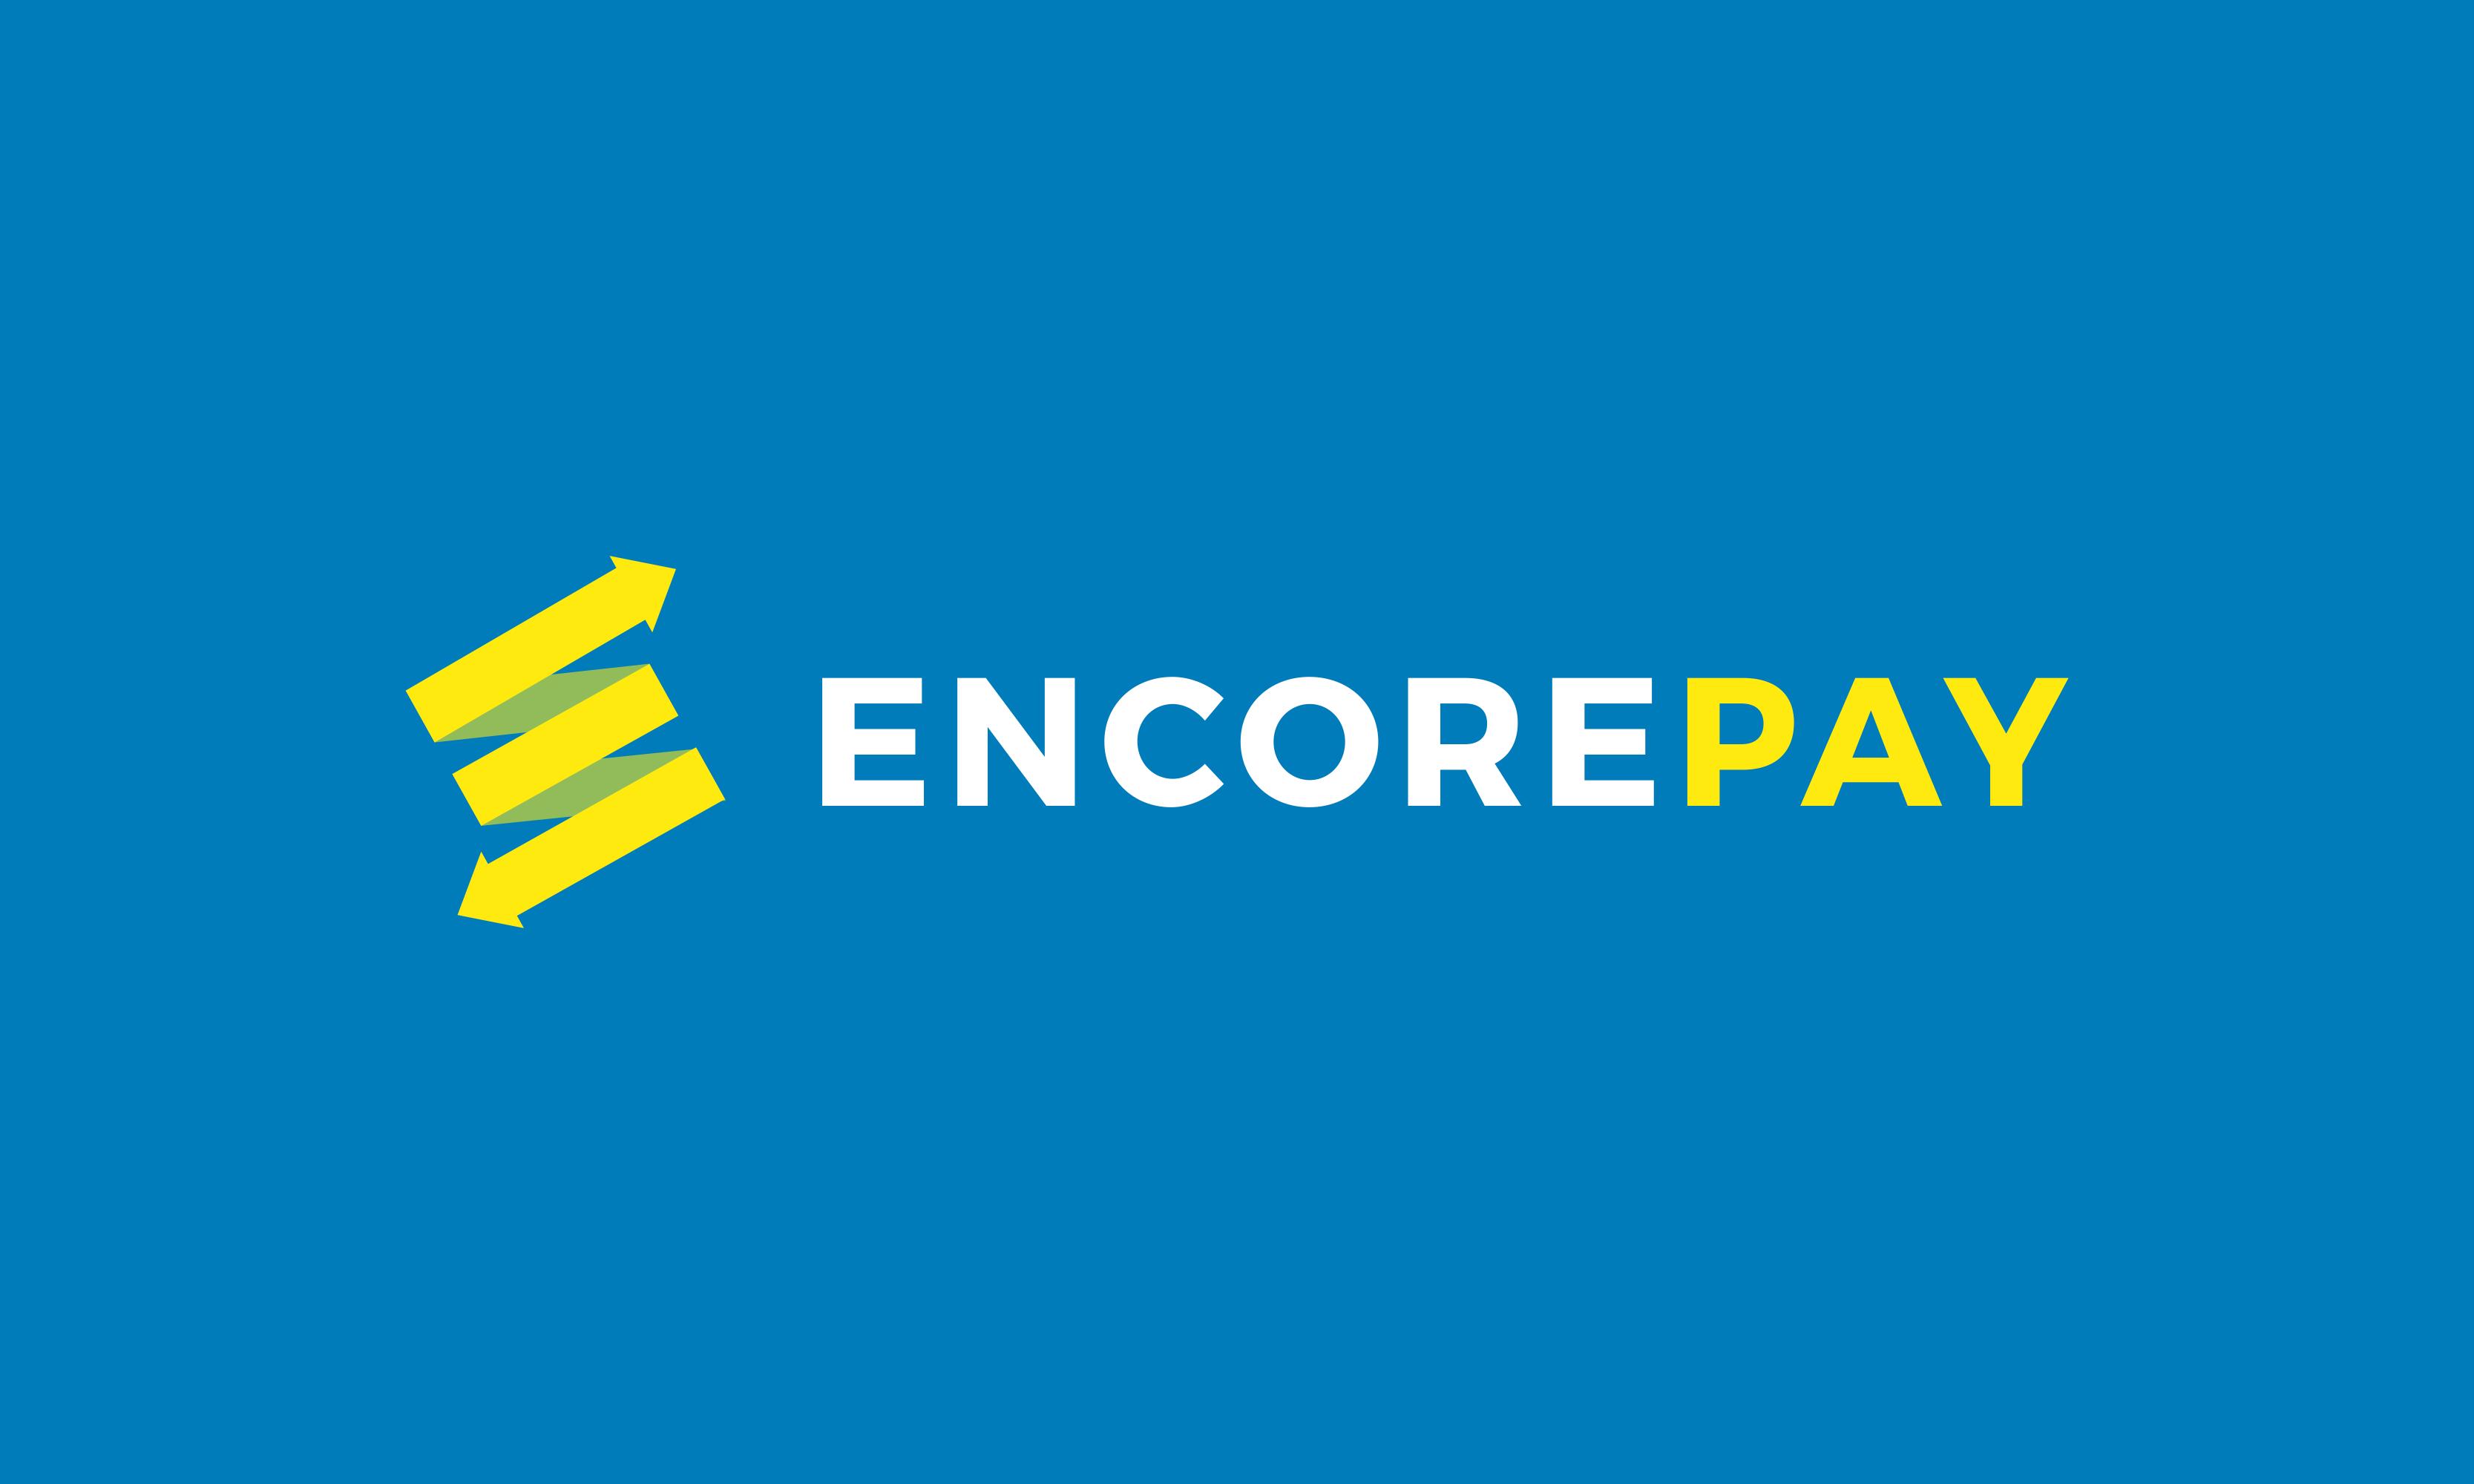 Encorepay